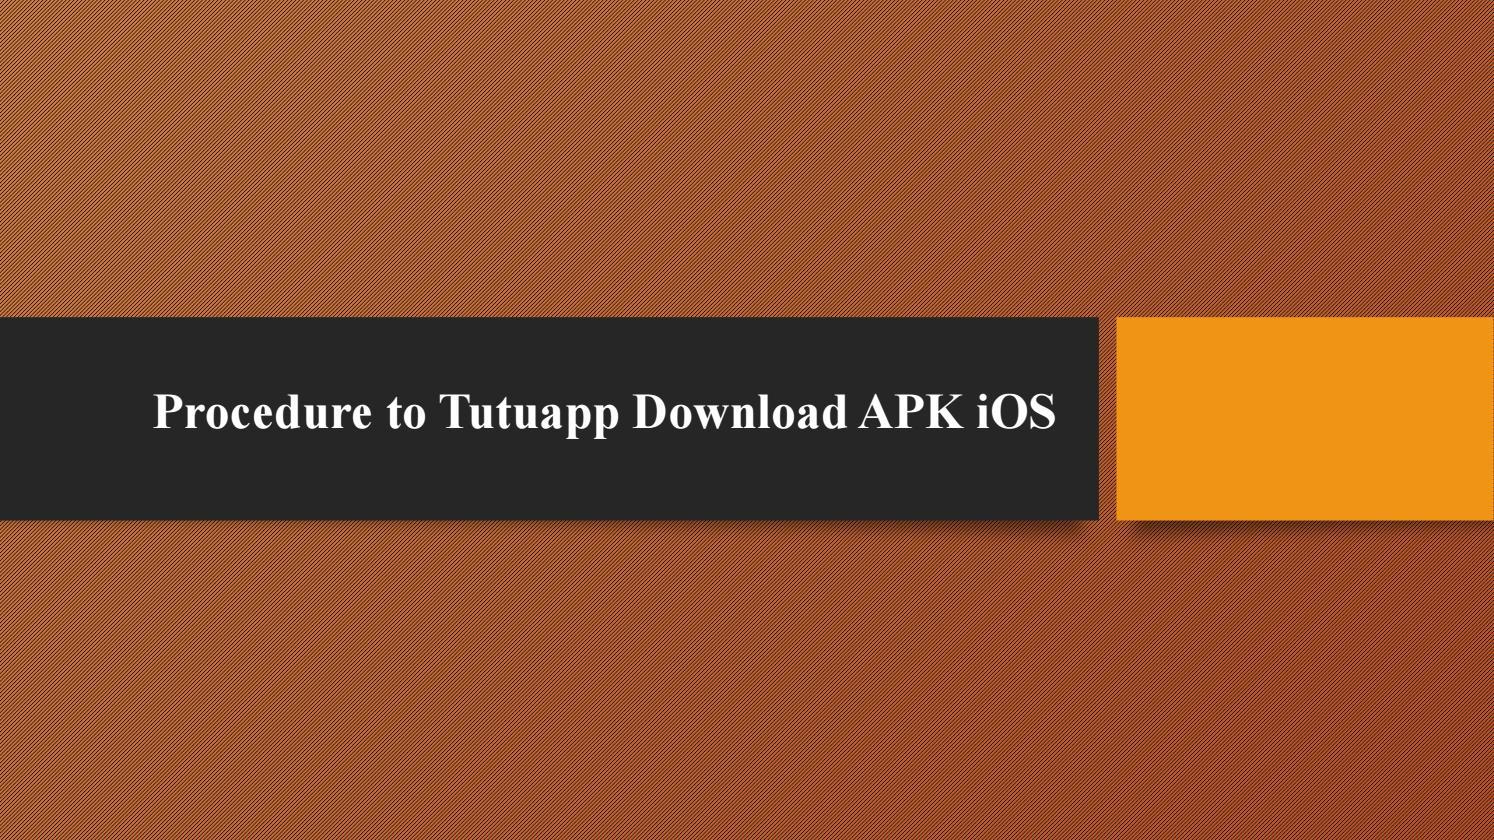 Procedure to Tutuapp Download APK iOS by devyani webratna - issuu